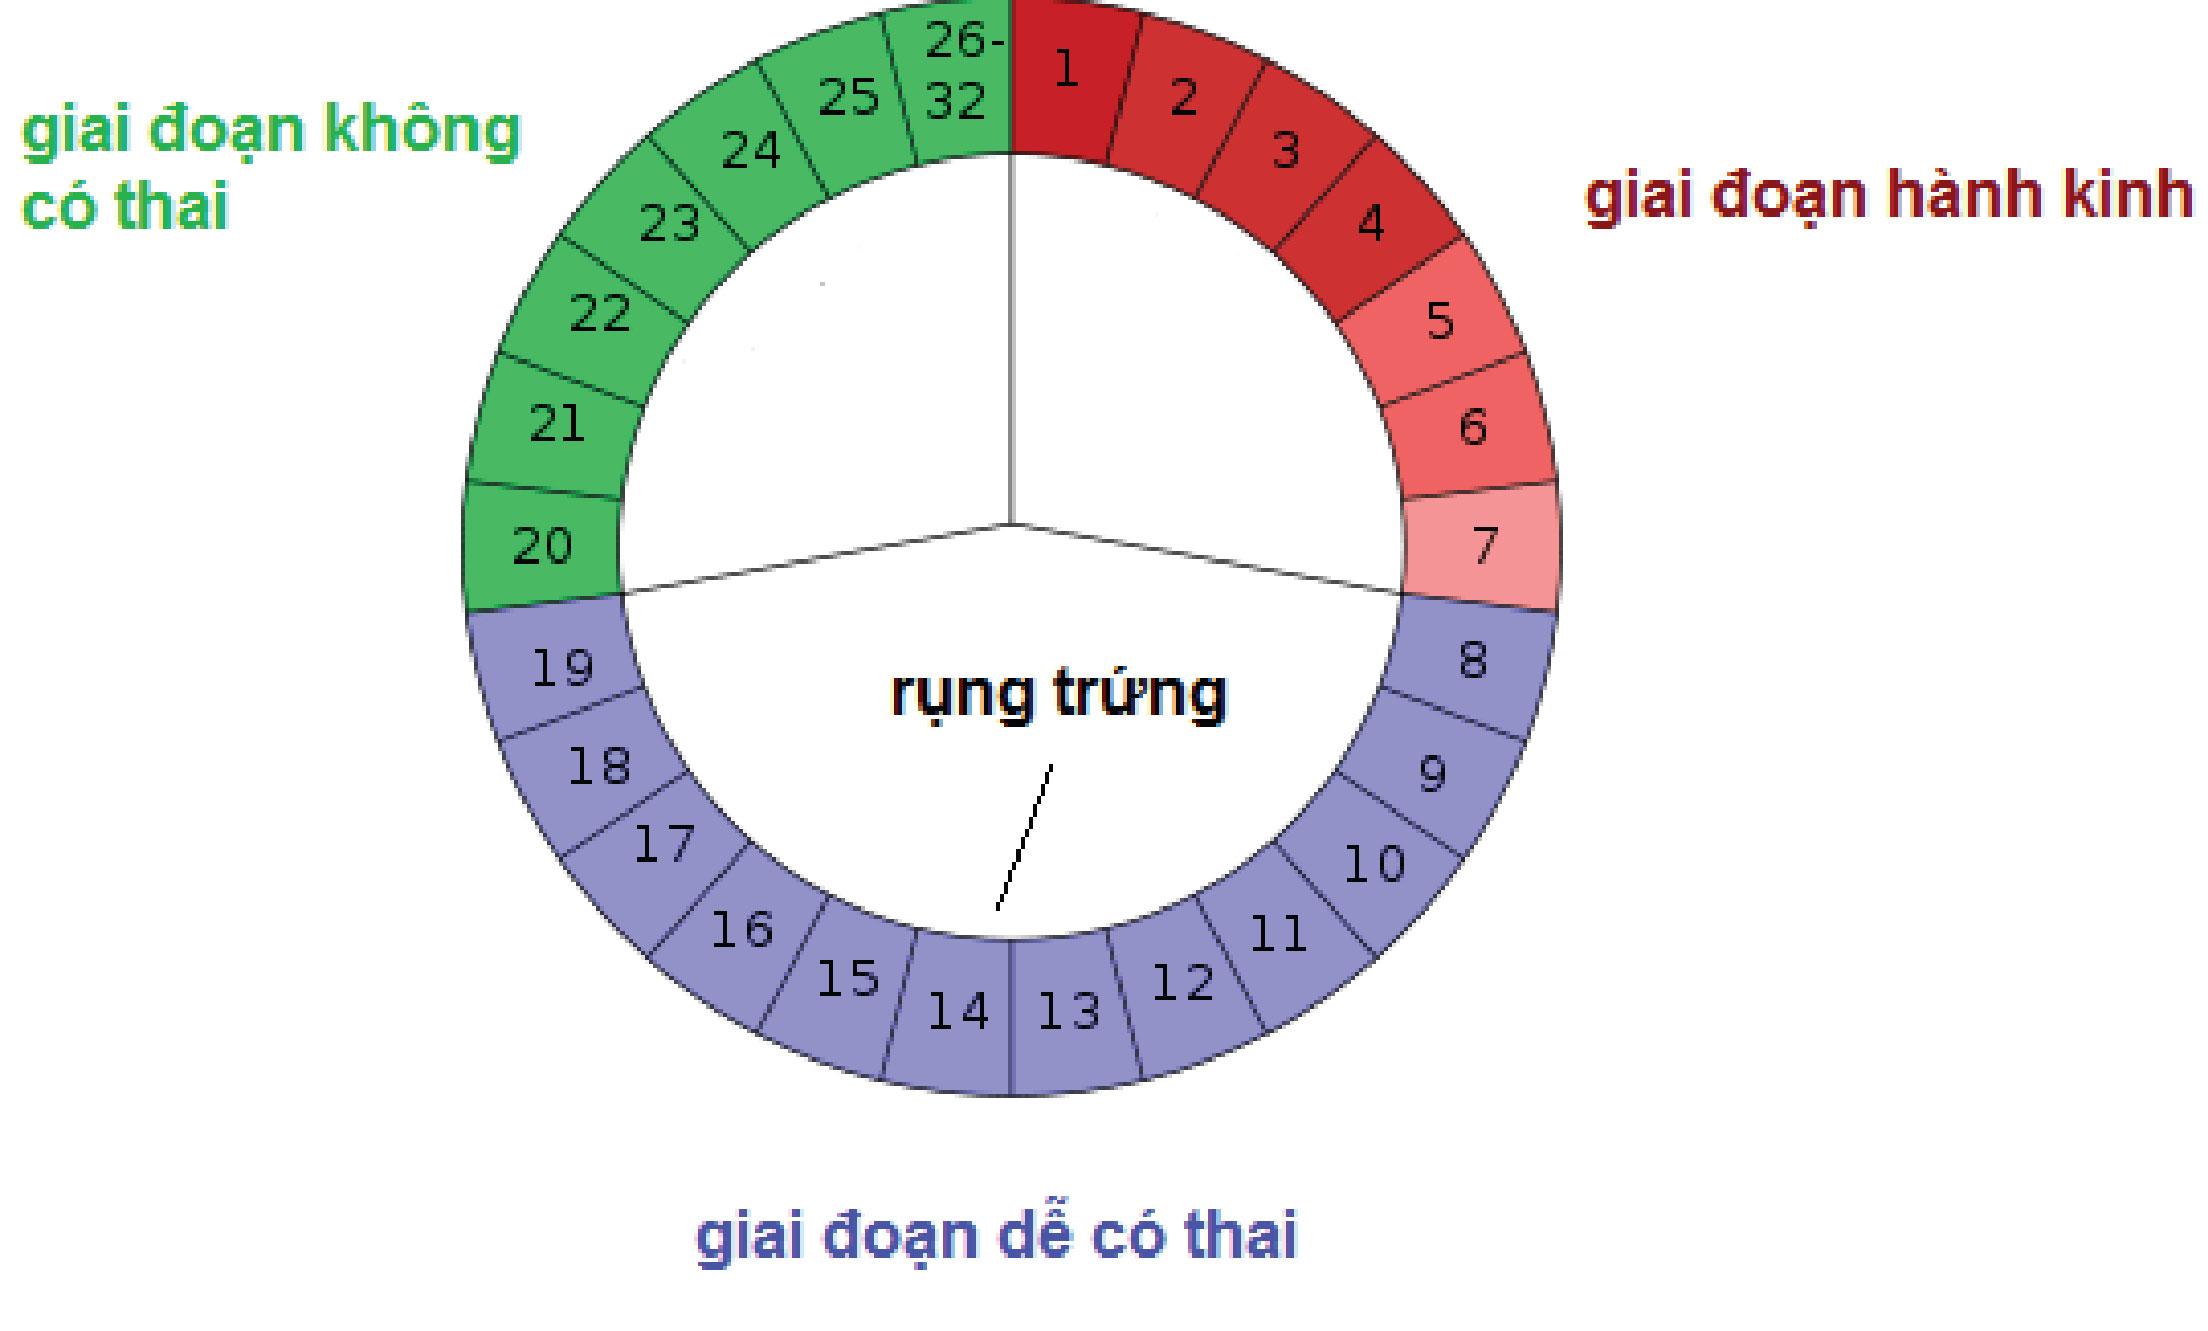 lam-nao-de-co-thai-nhanh-nhat1